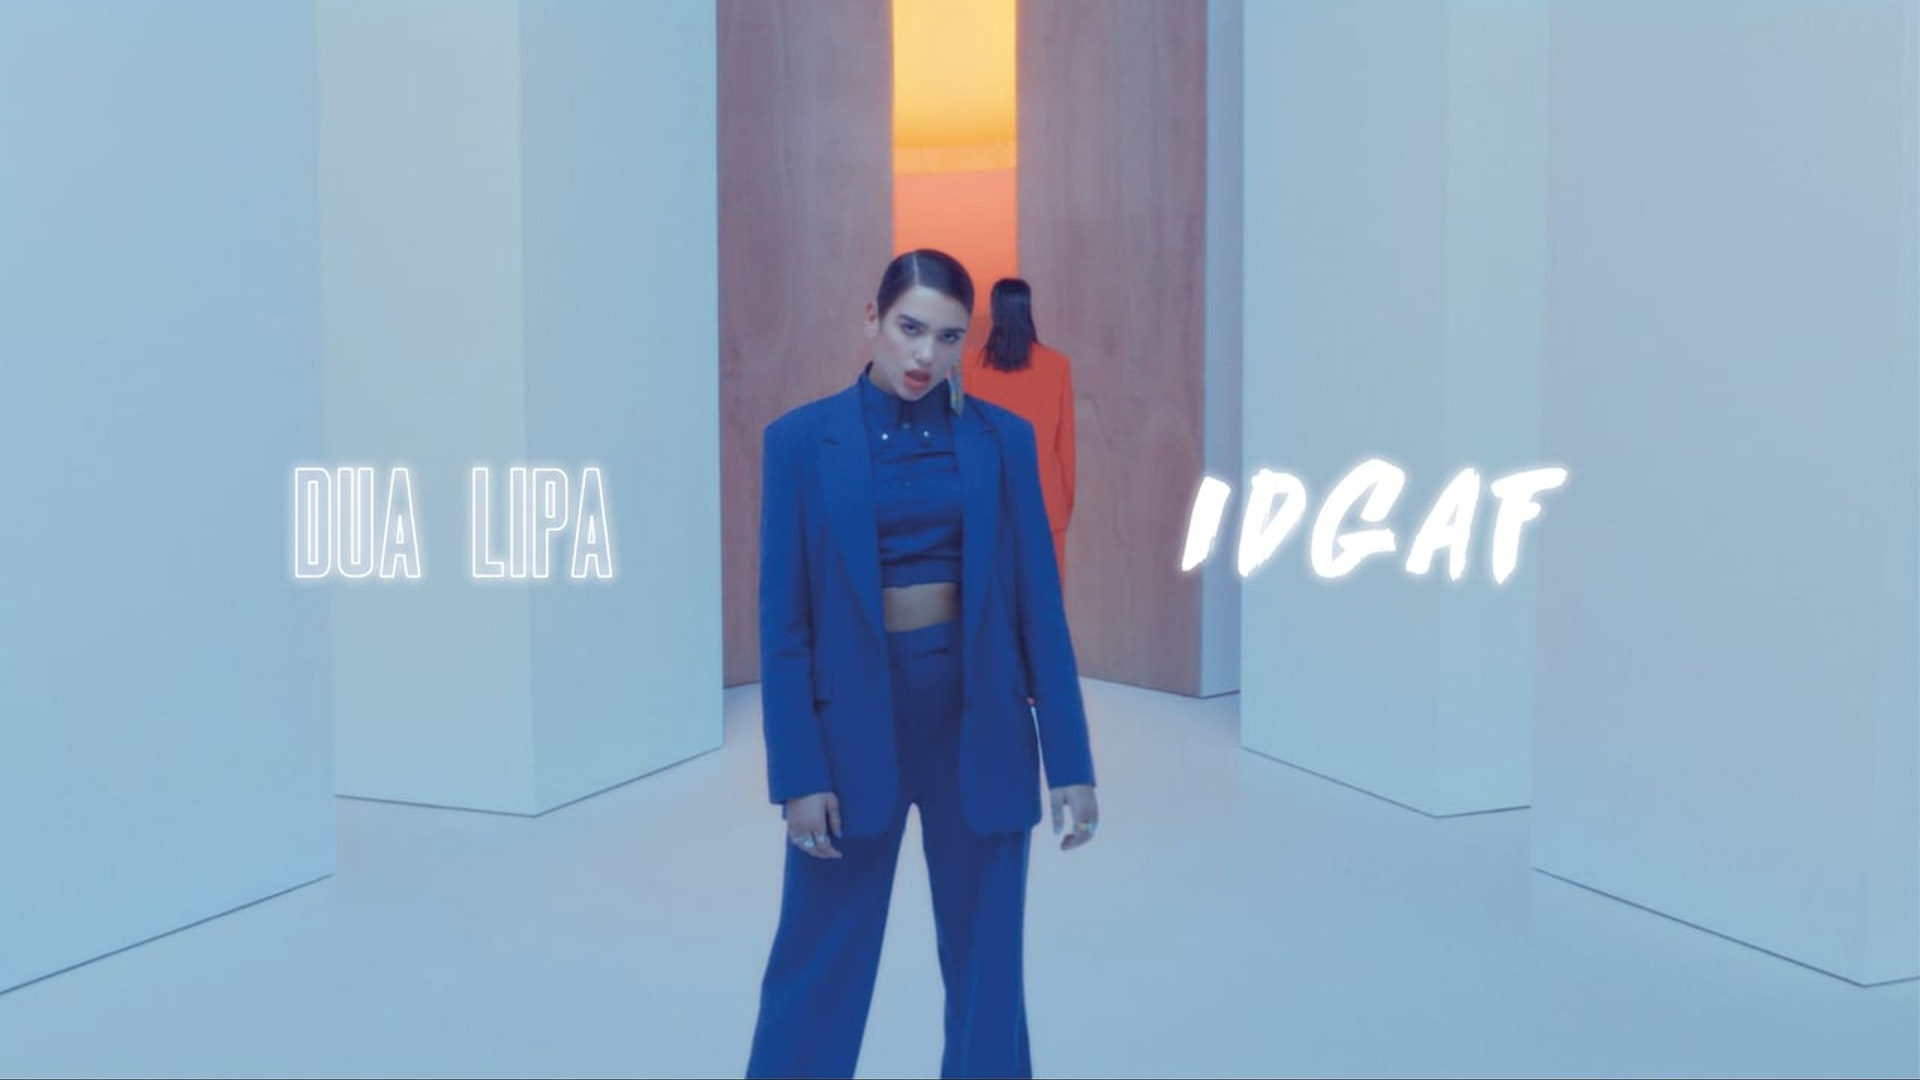 IDGAF_Vimeo